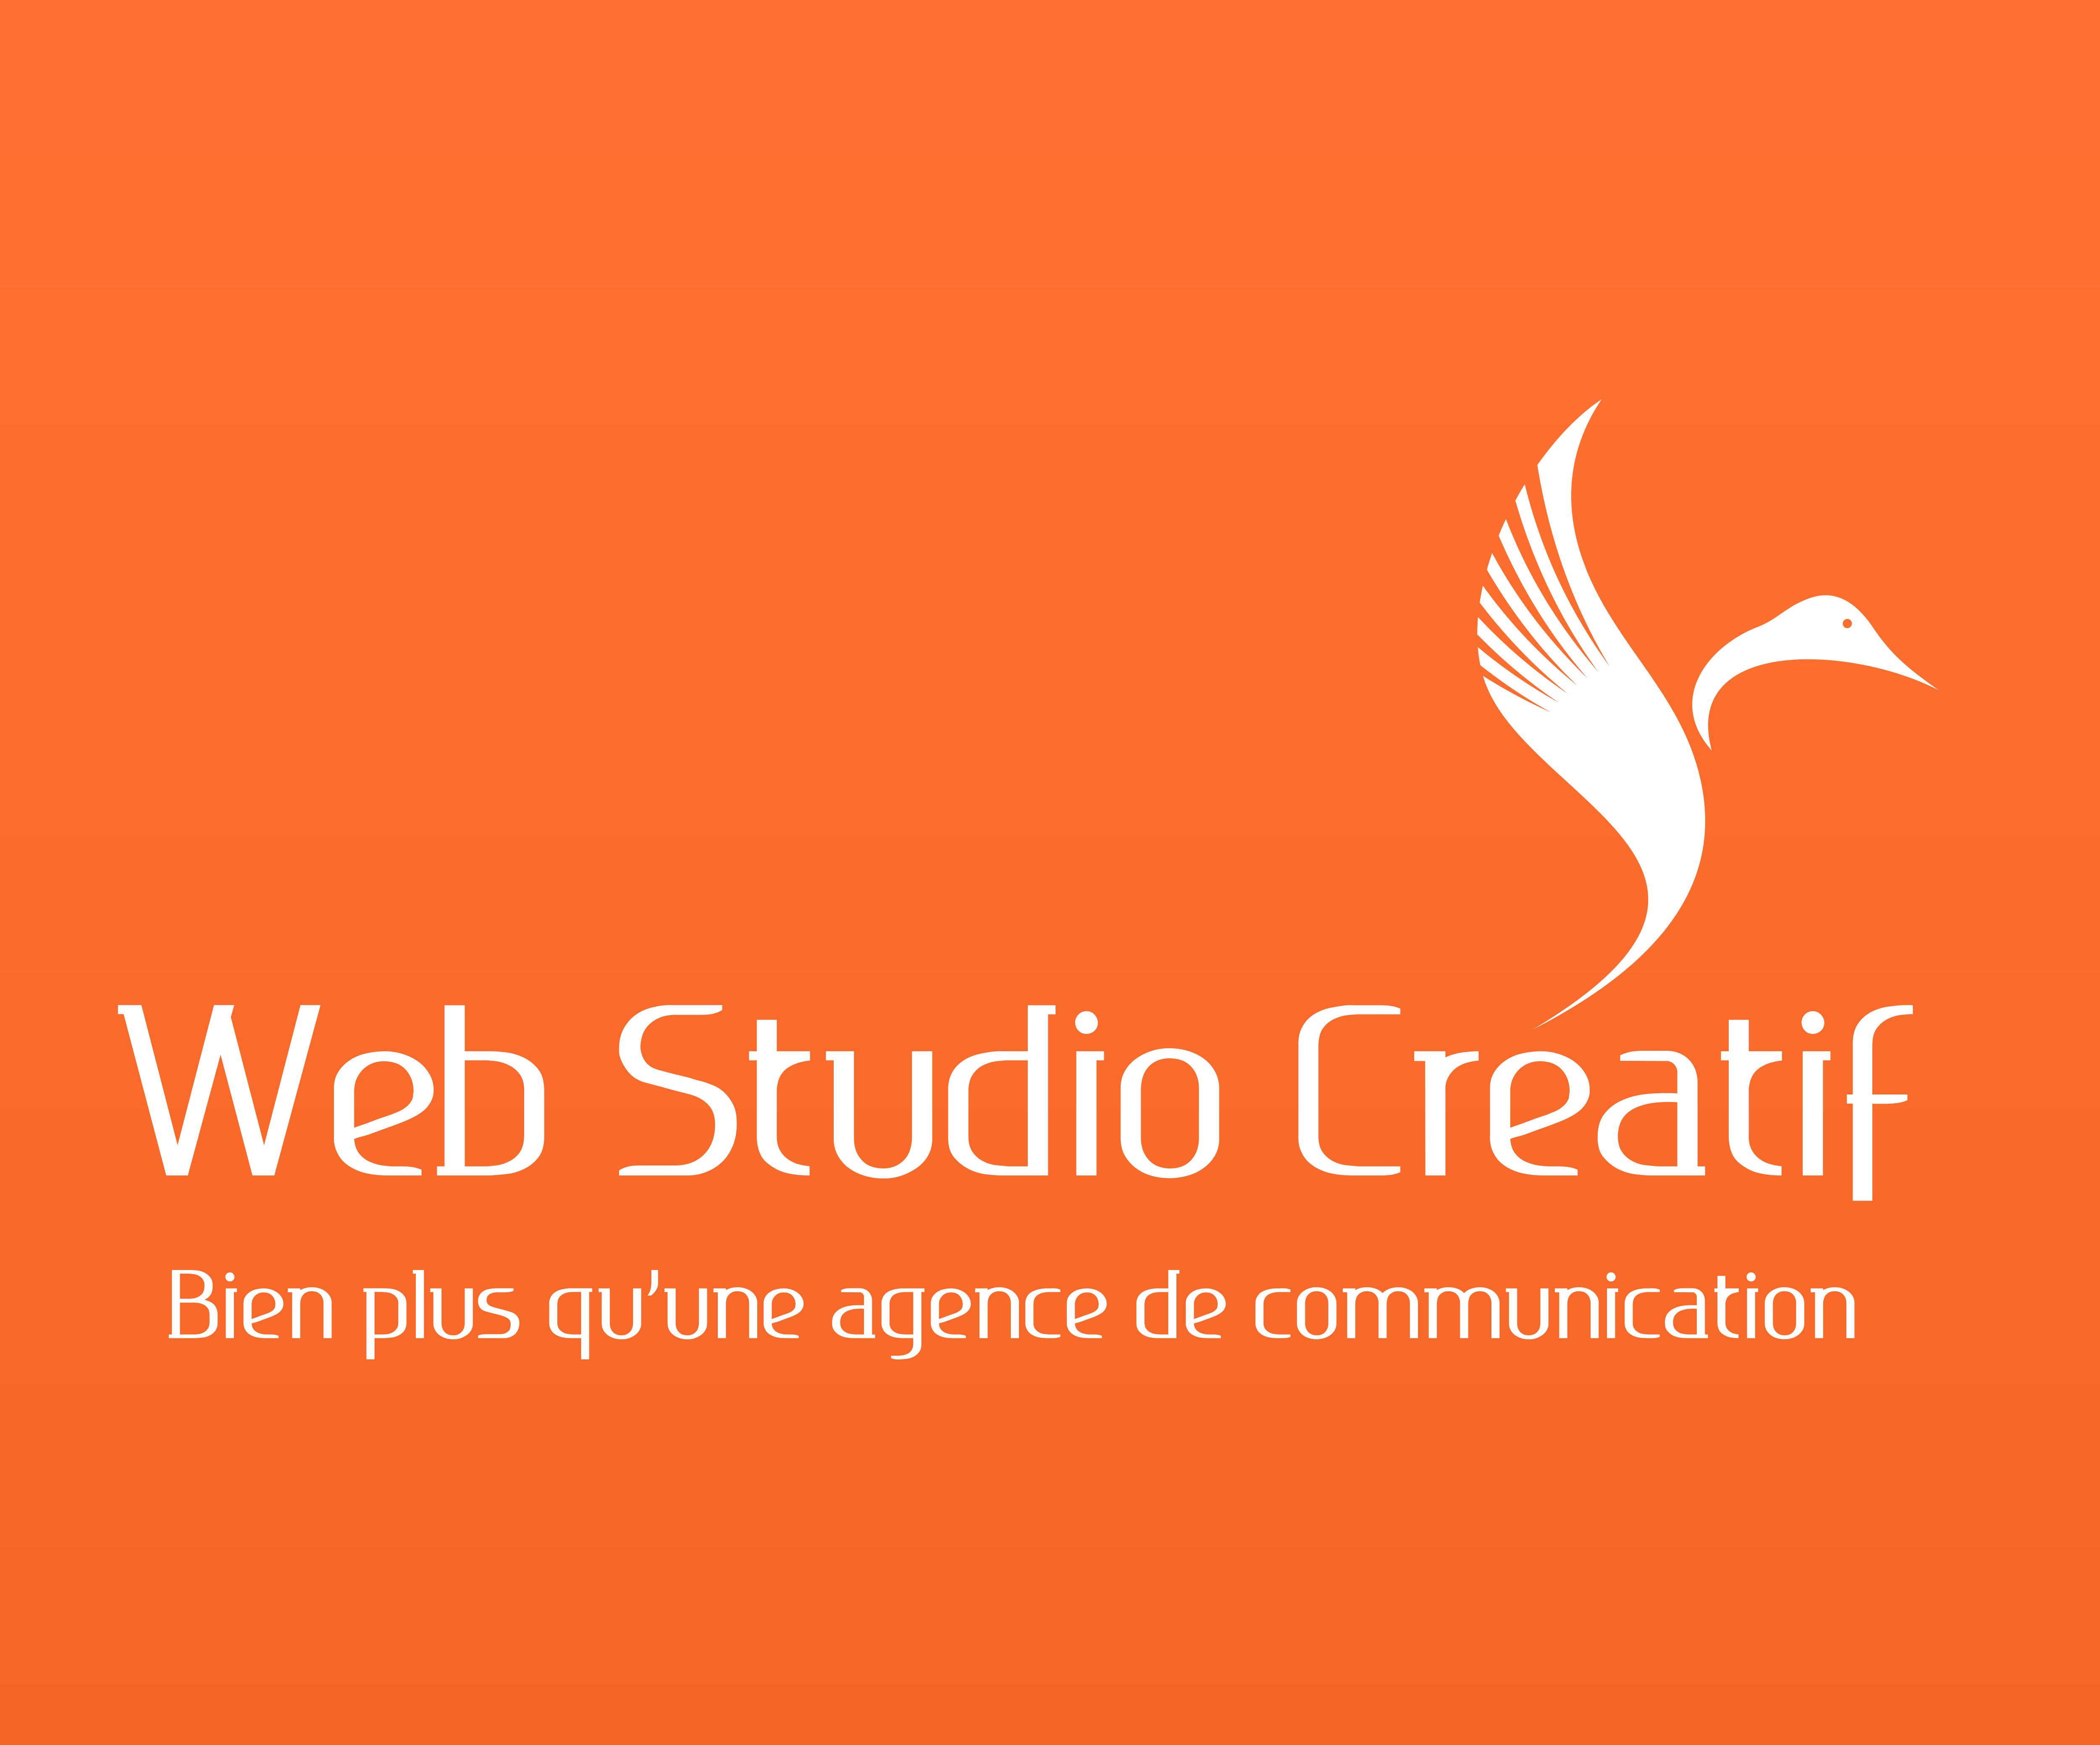 Web Studio Creatif